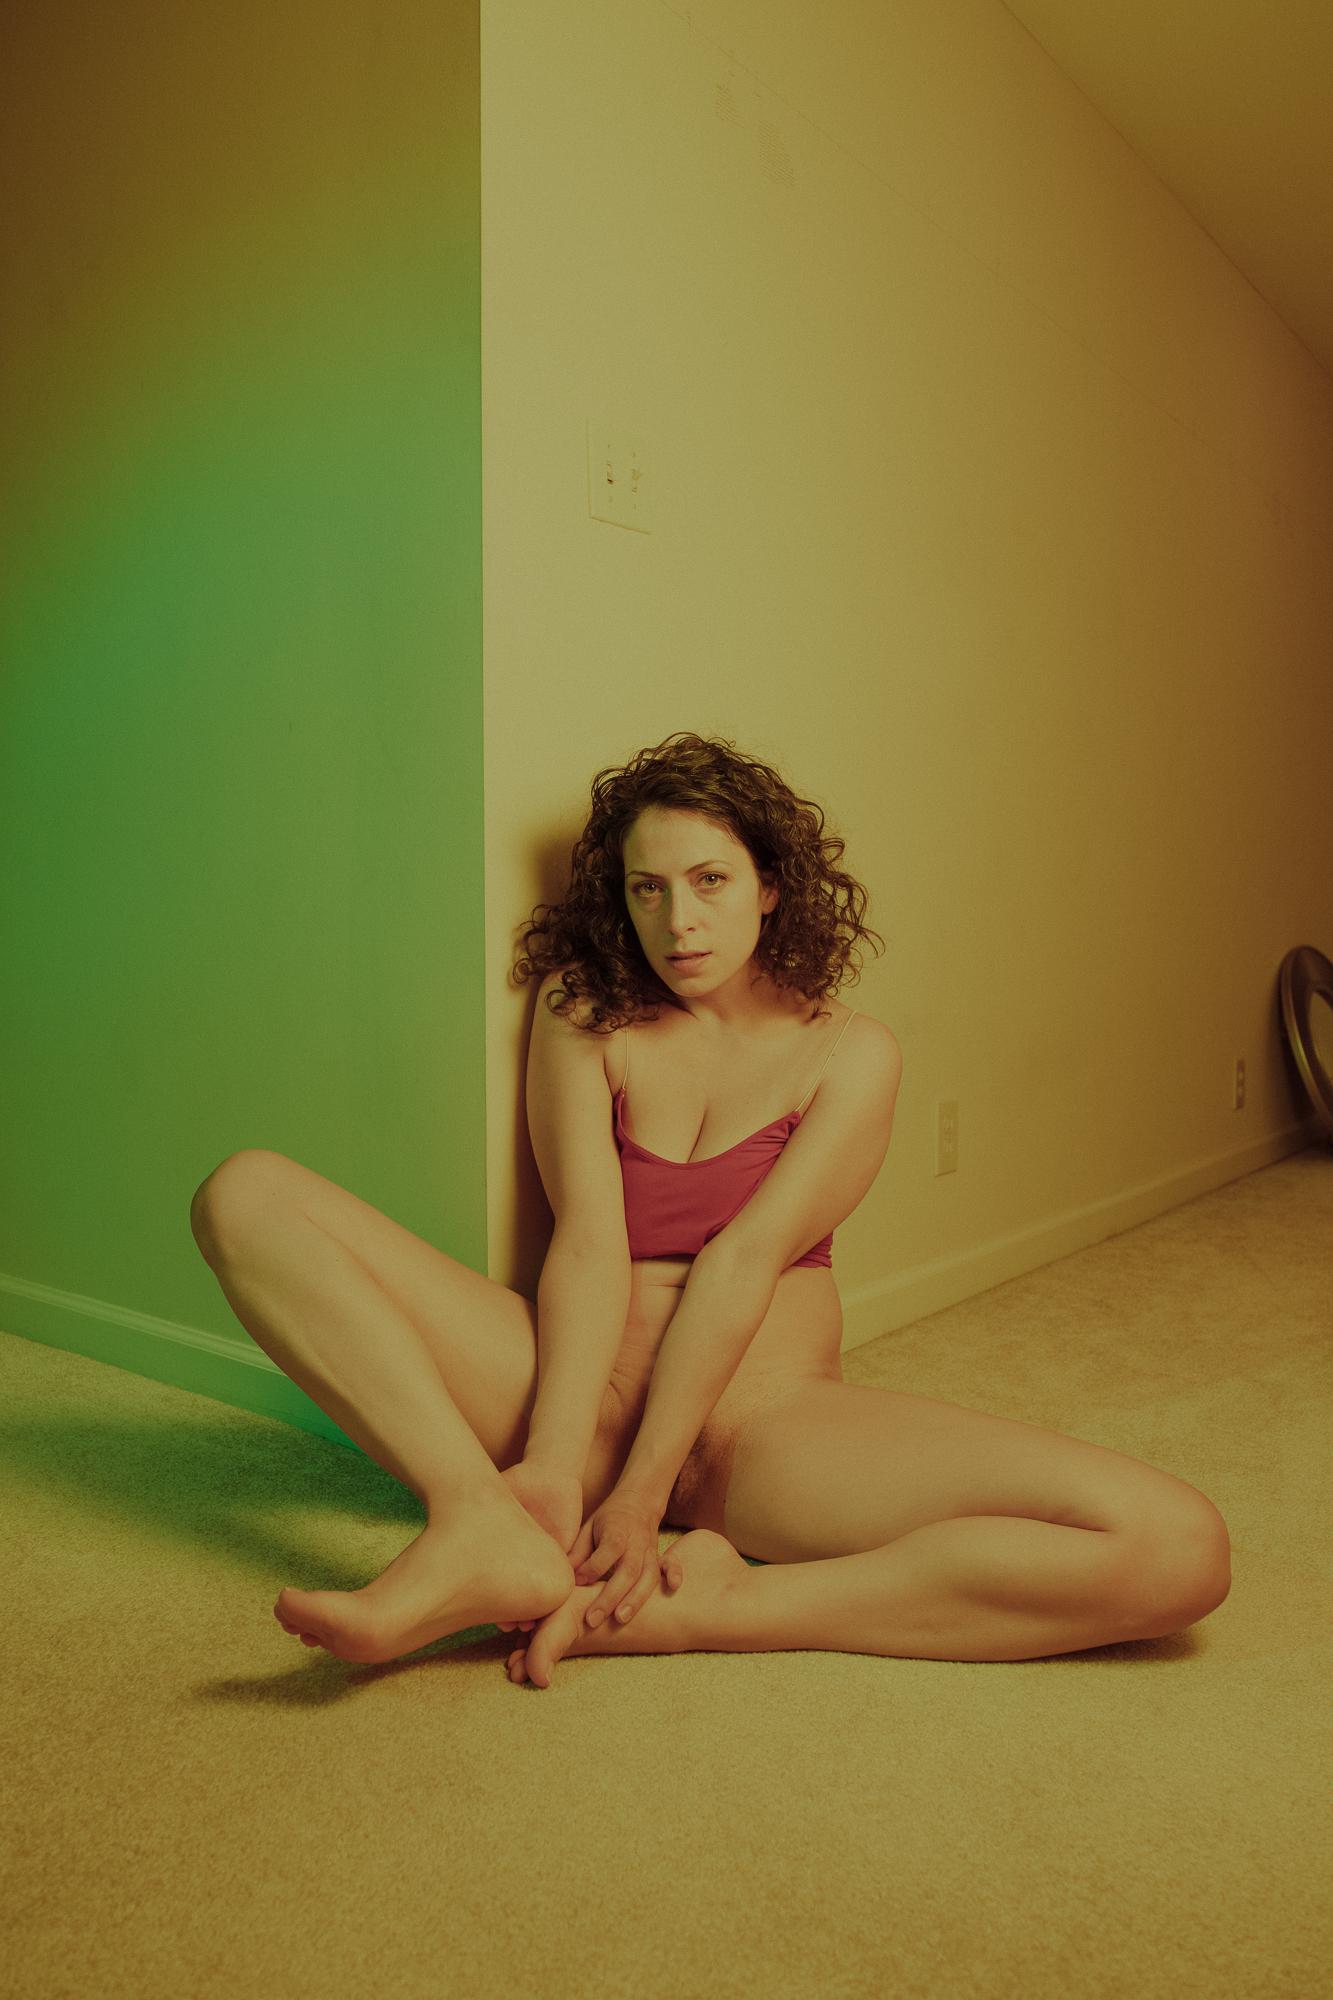 20180823-Hannah-yellow-green-bday-X-T2-0026-Edit.jpg